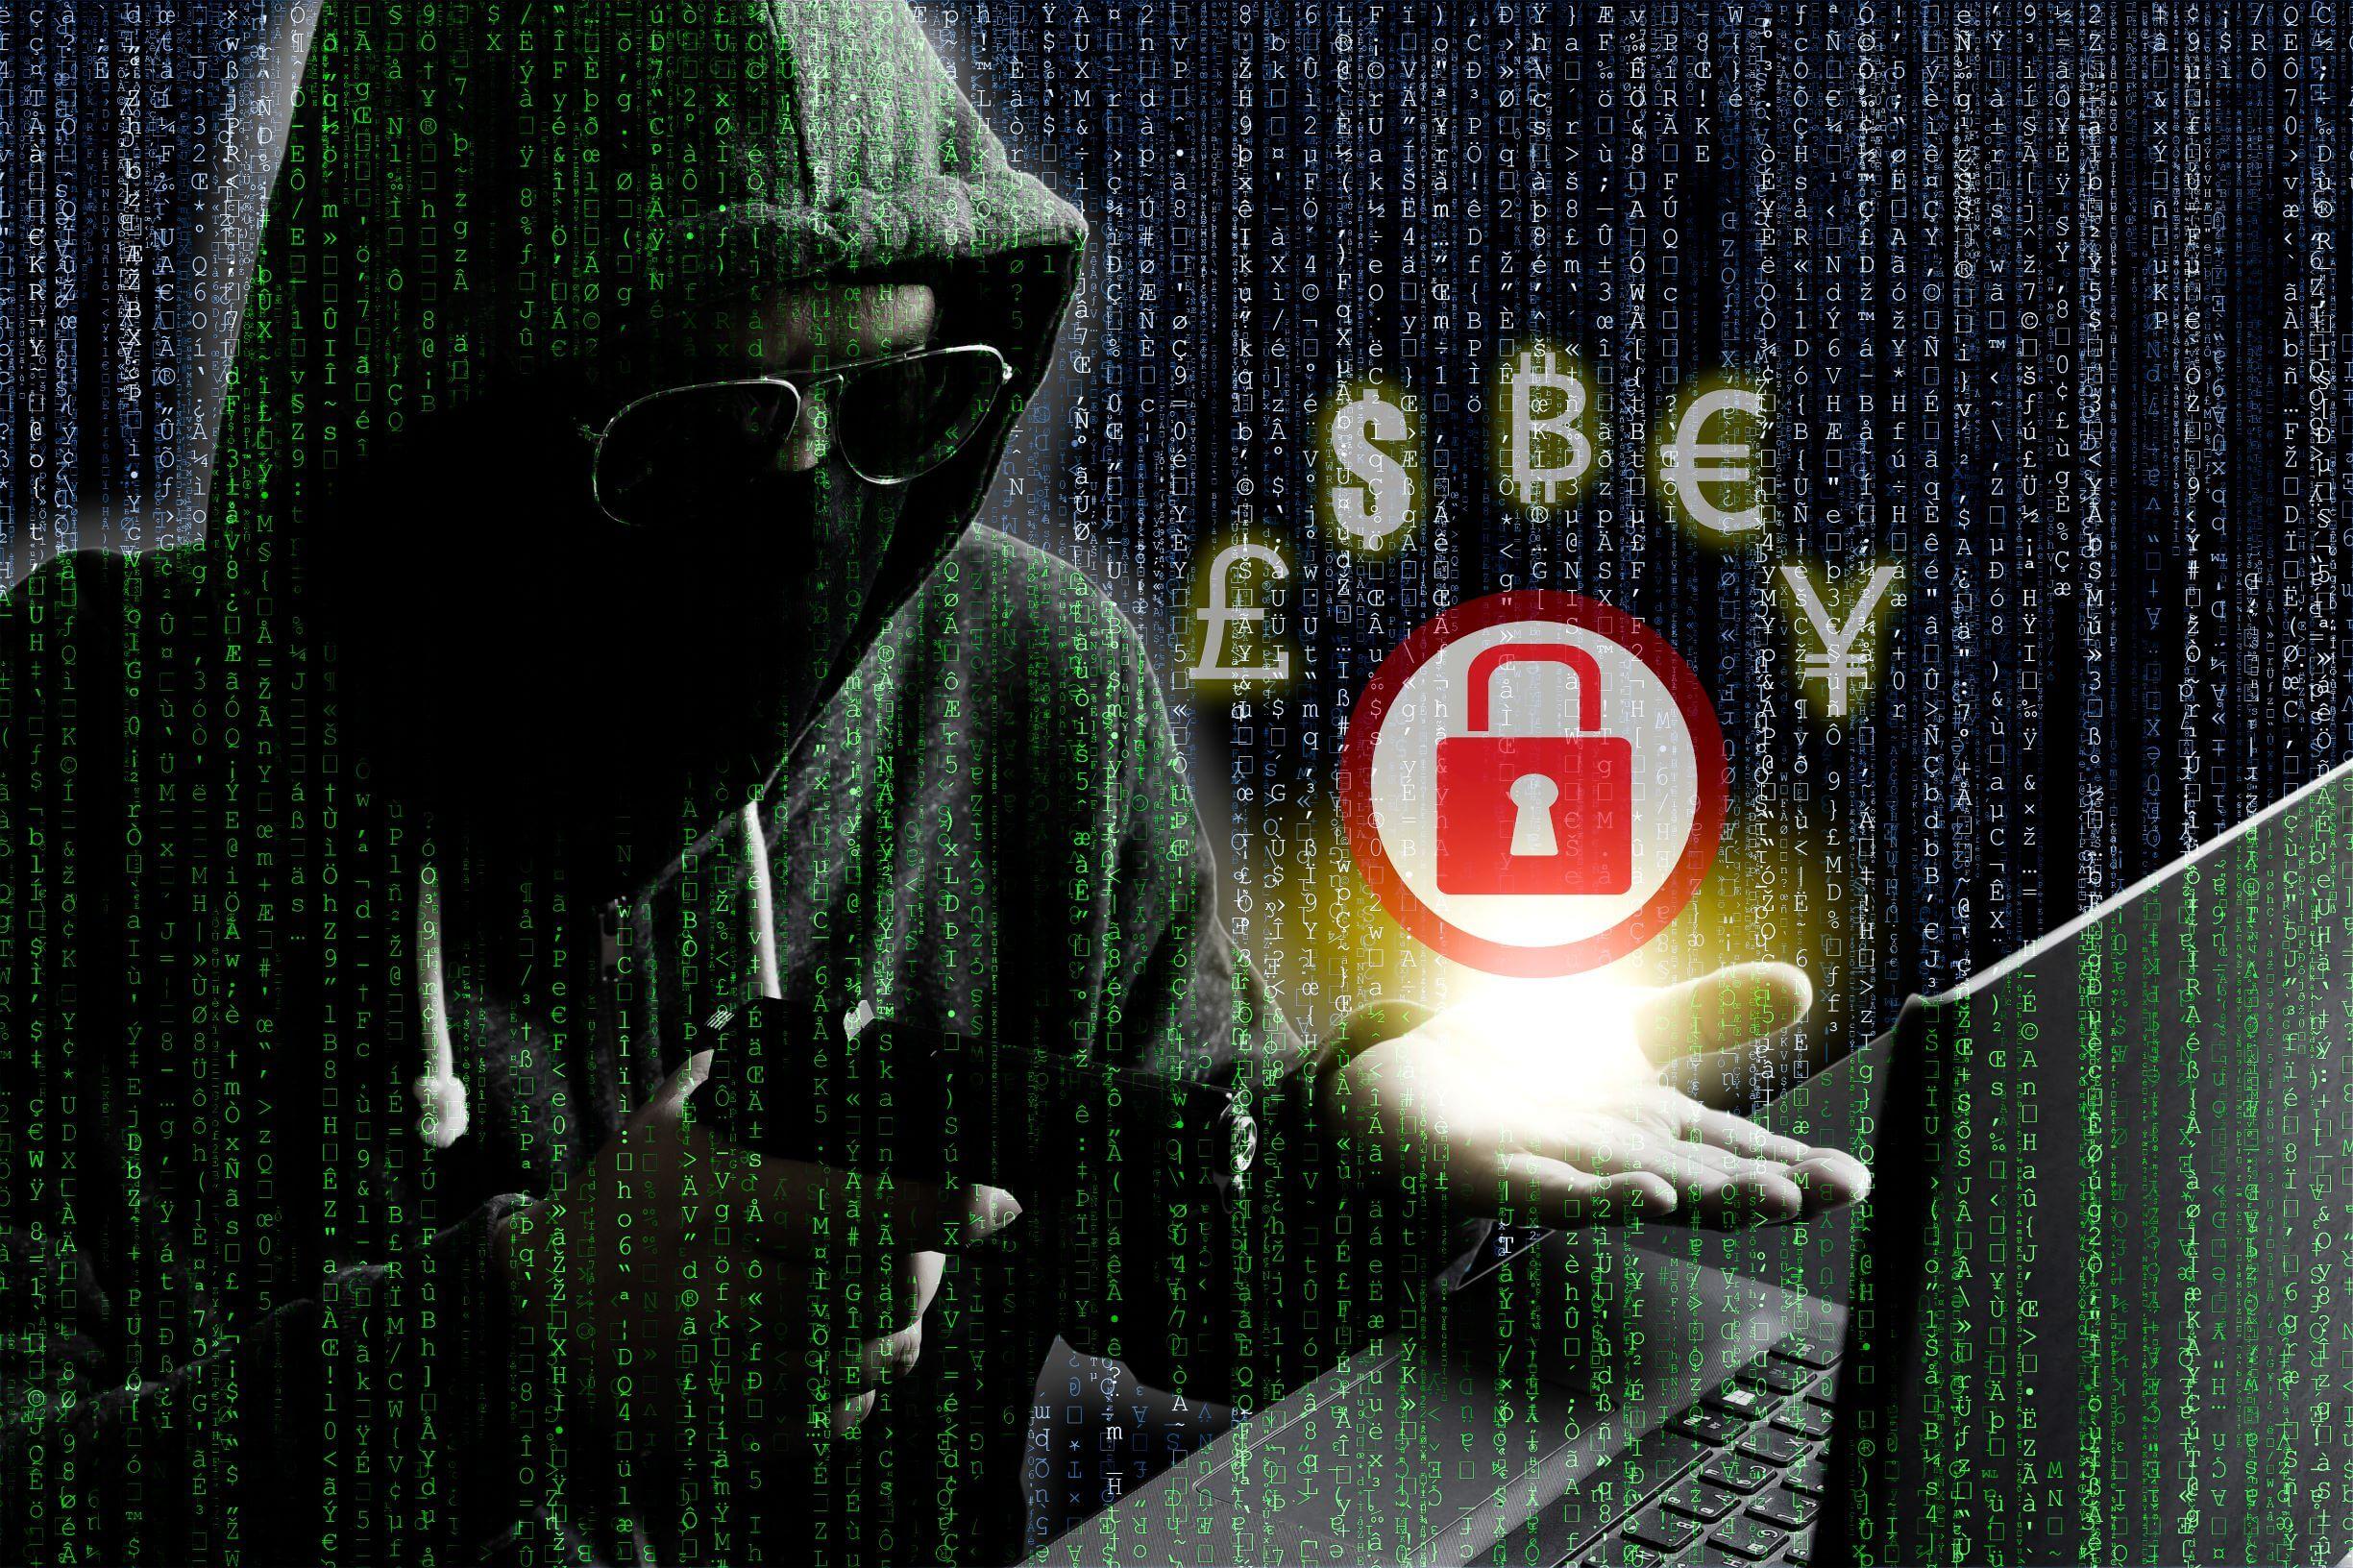 easyJet Cyber-attack Timeline